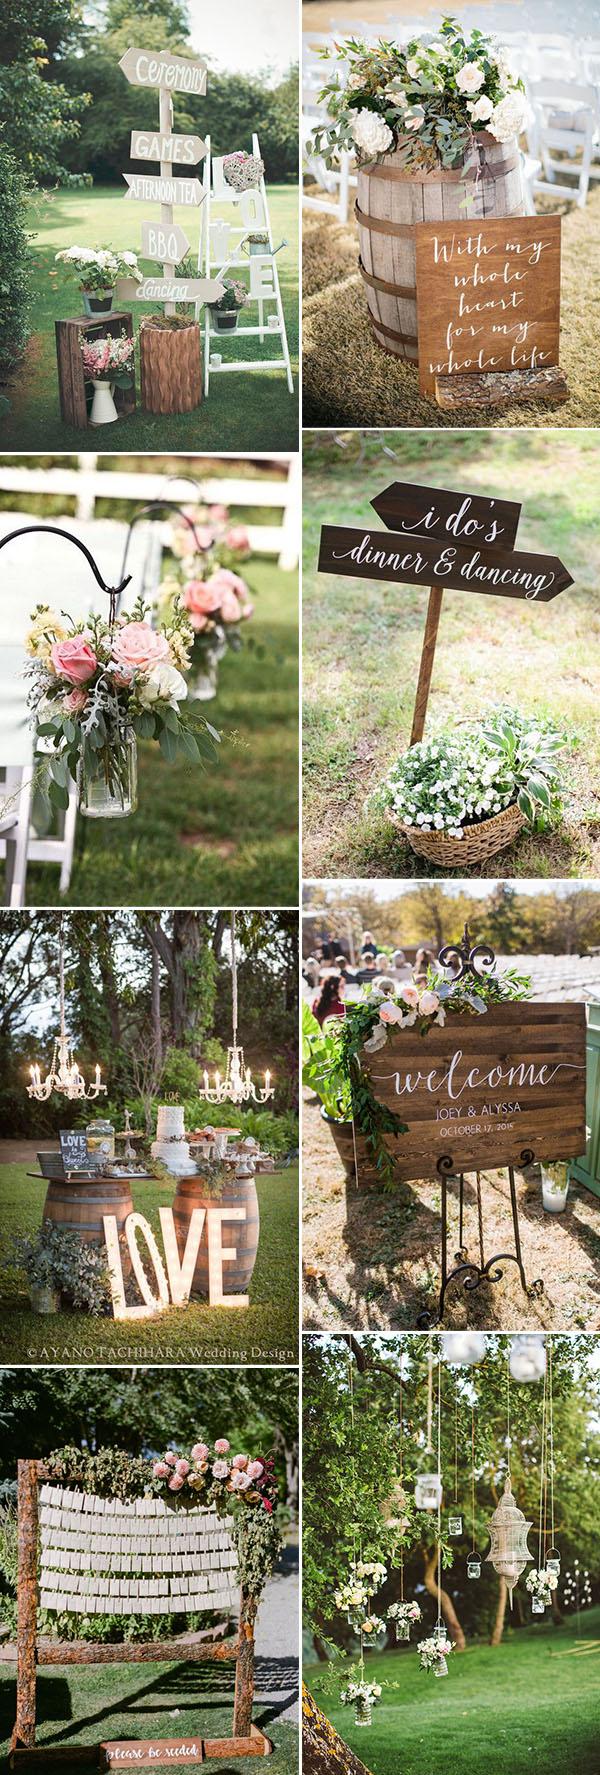 Amazing Wedding Ideas 48 Most Inspiring Garden Inspired Wedding Ideas